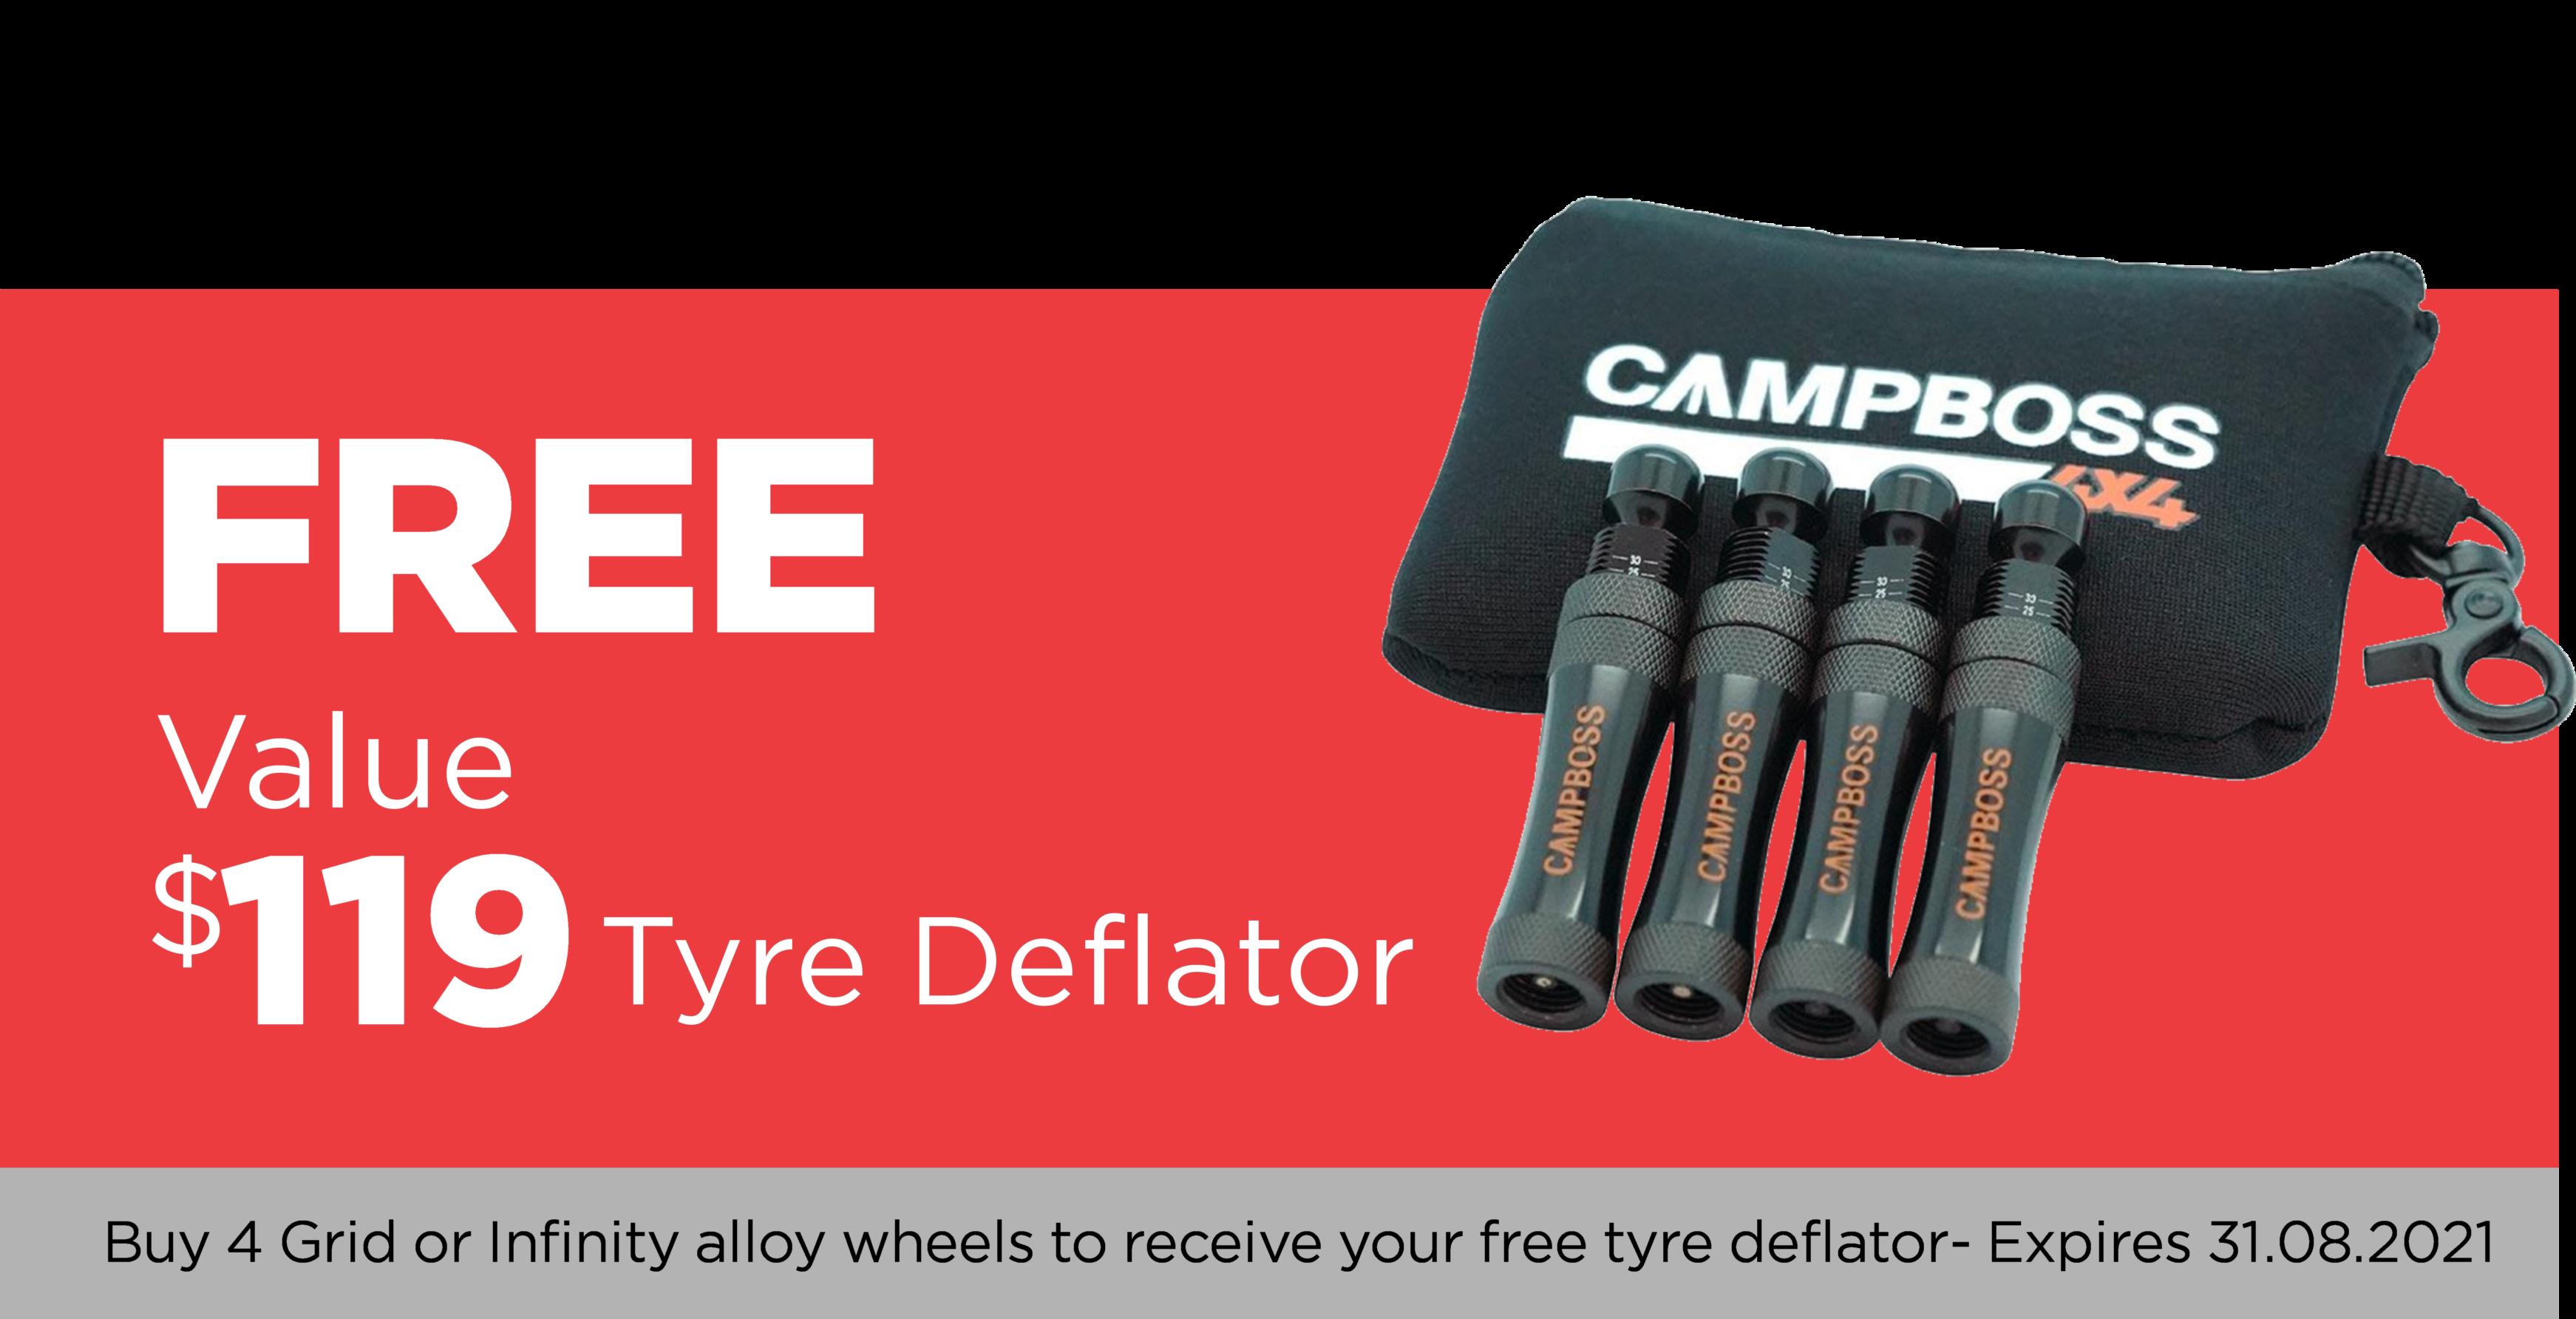 Free Tyre Deflator in August